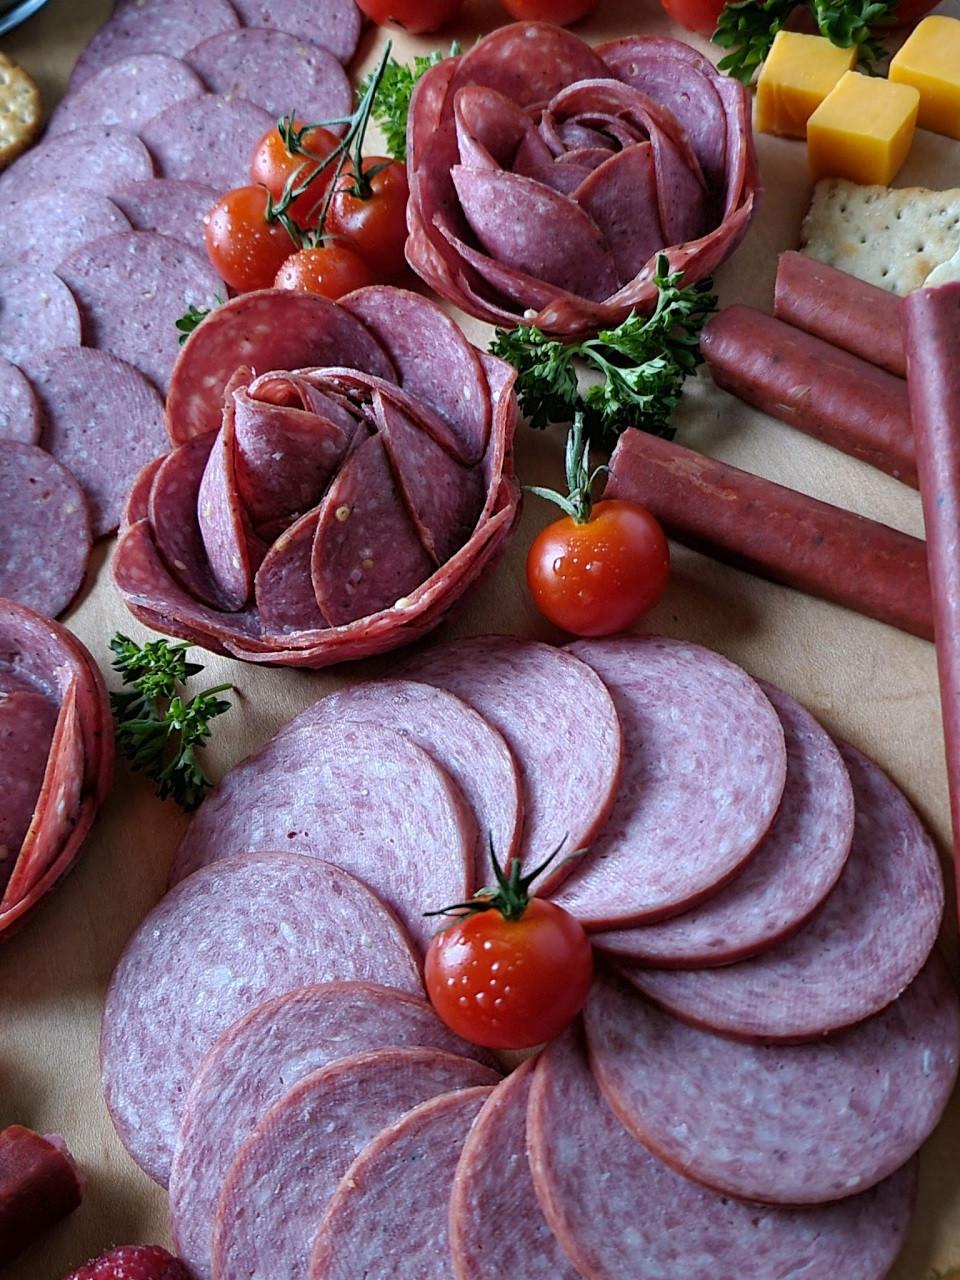 Gottenburg Summer Sausage approx 2lb artificial casing